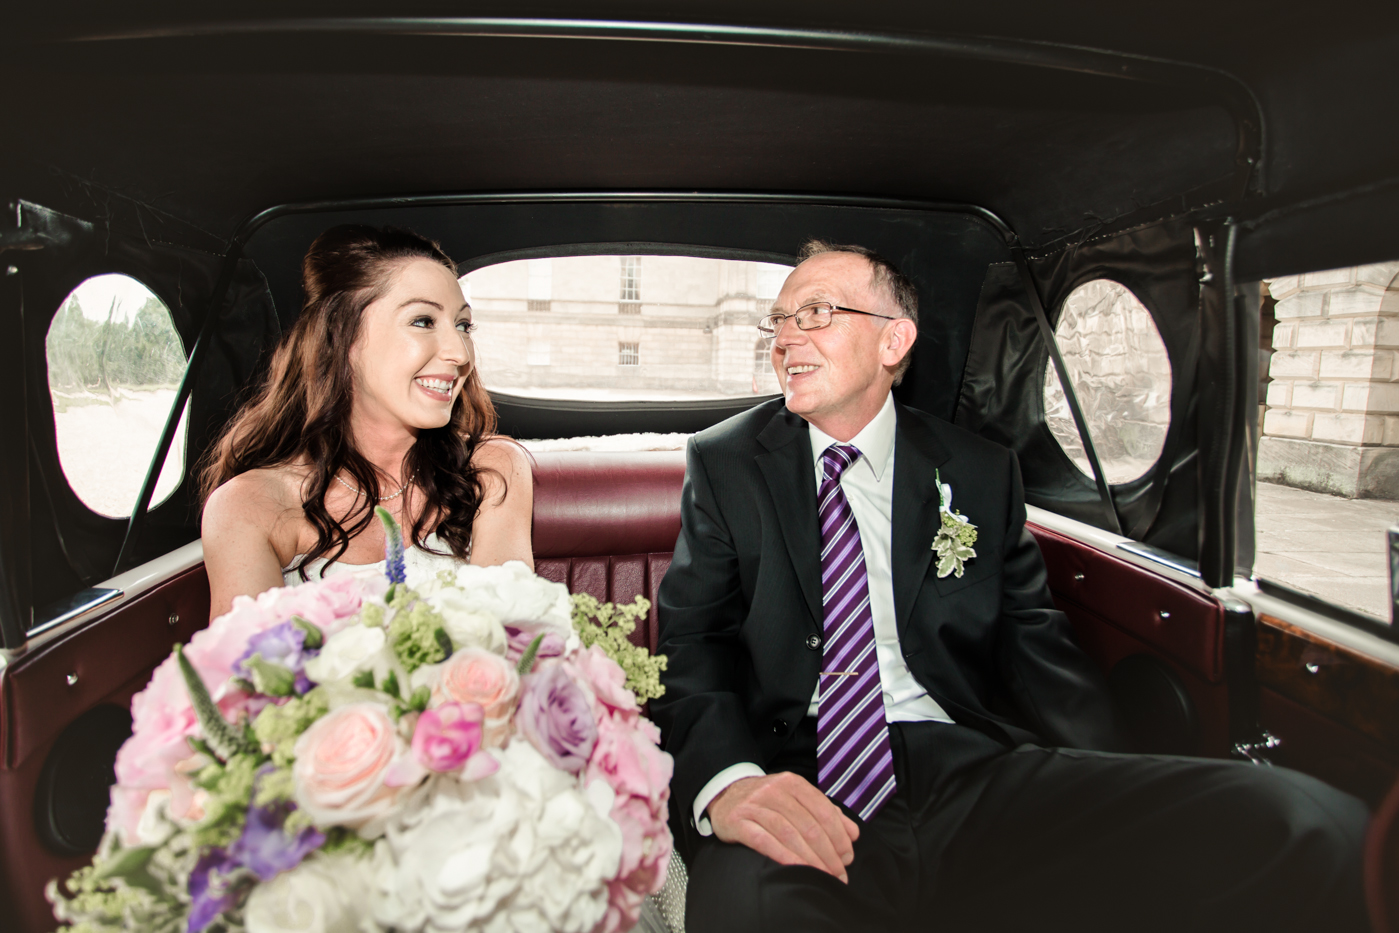 042 - Abi and Chris at Kedleston Hall - Wedding Photography by Mark Pugh www.markpugh.com - 0056.JPG